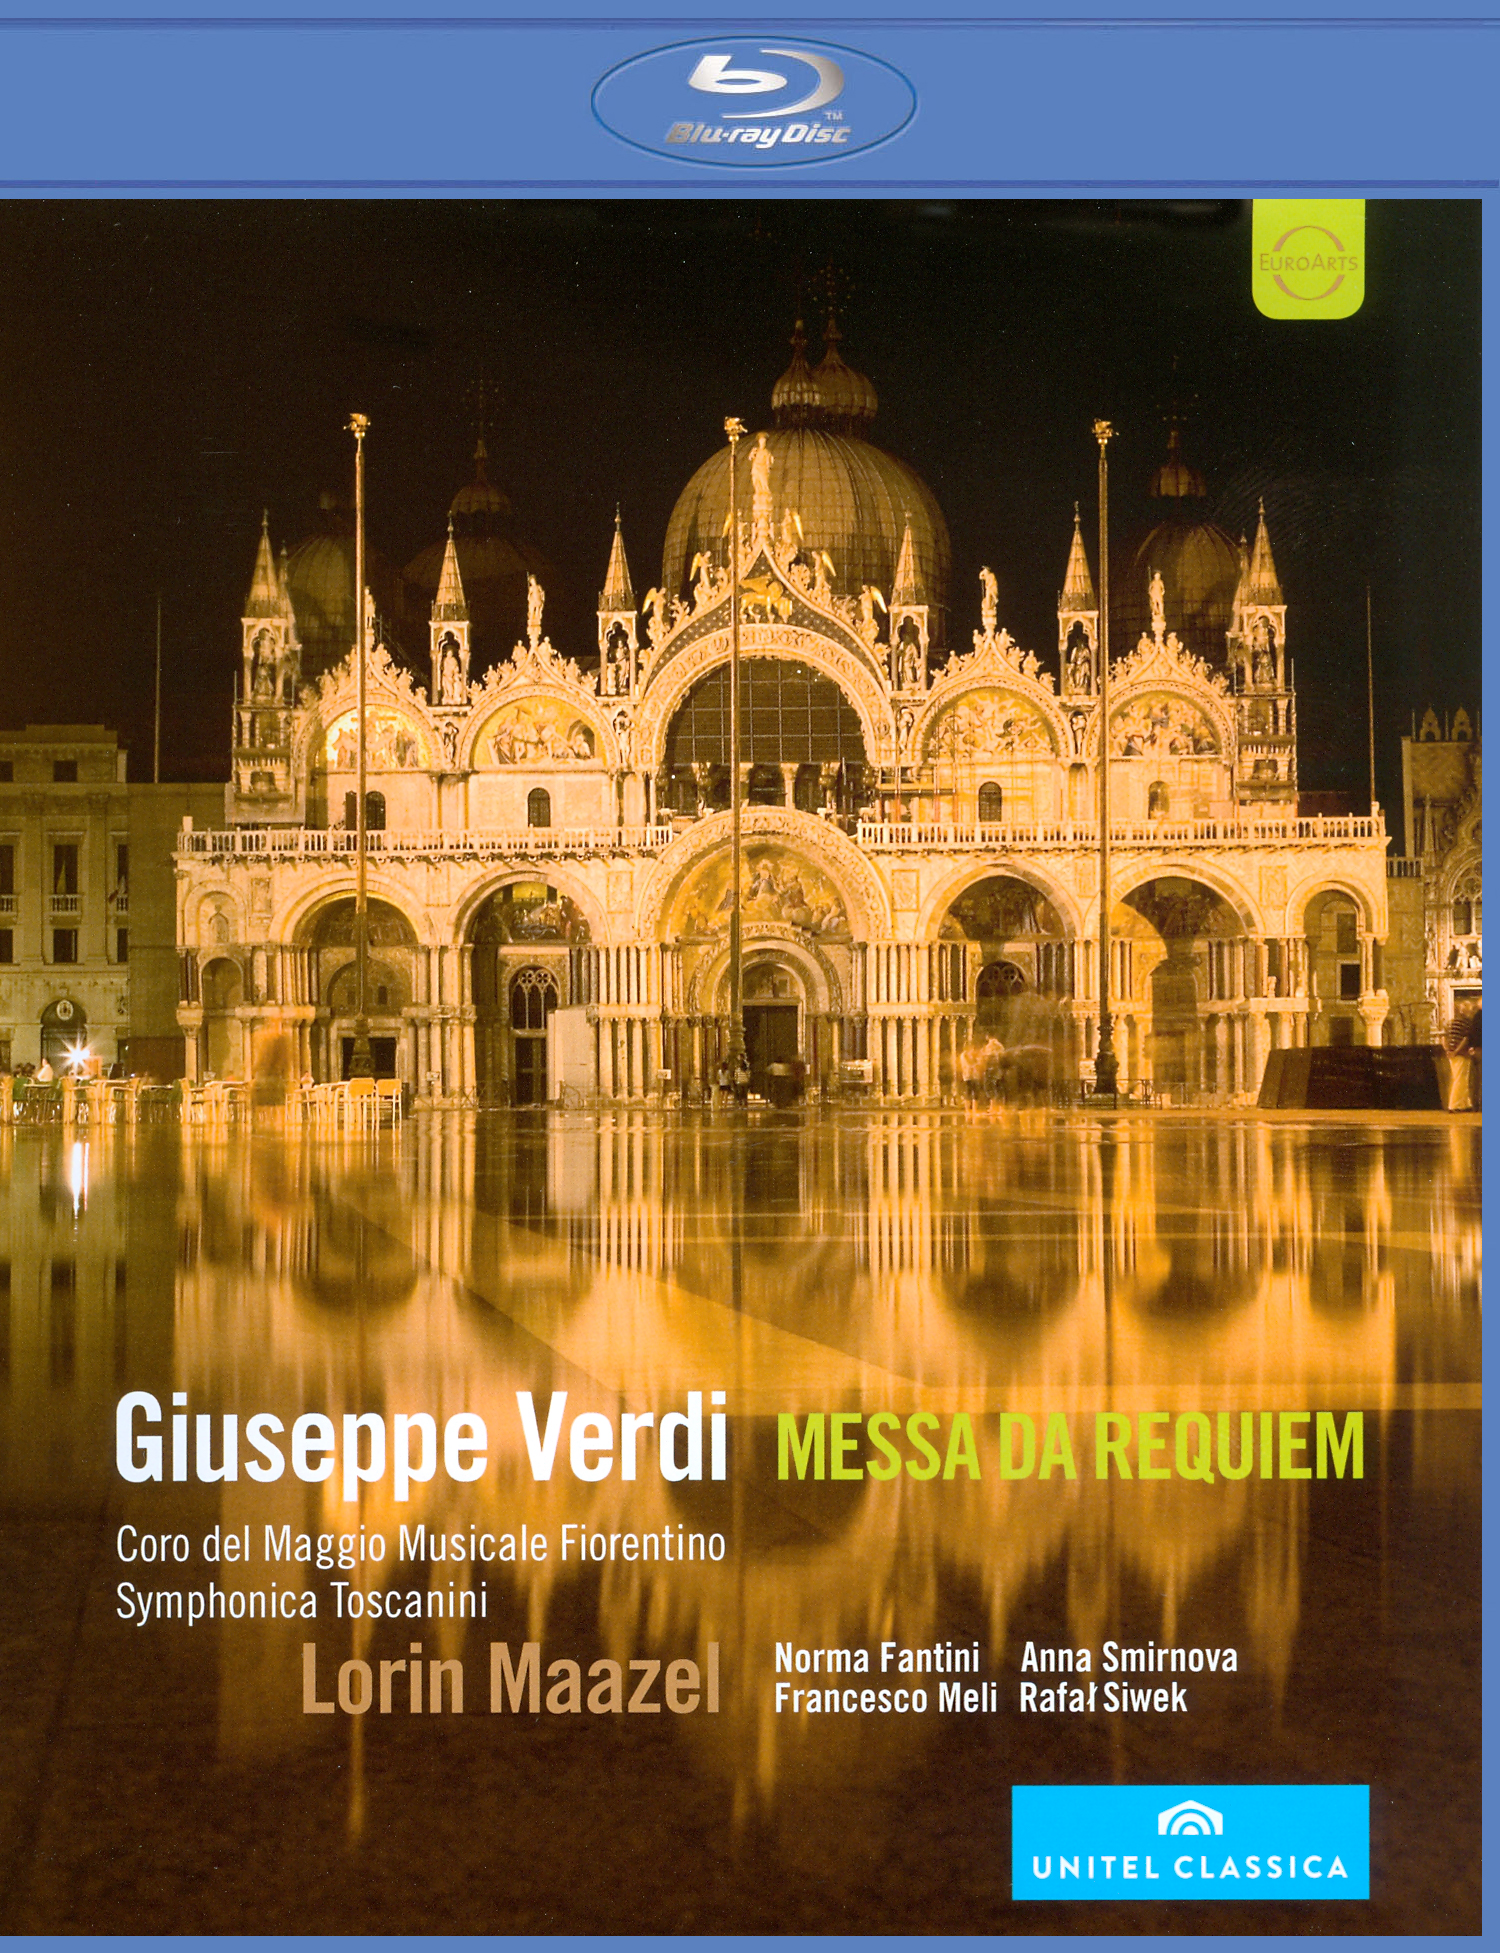 Lorin Maazel: Giuseppe Verdi - Messa da Requiem